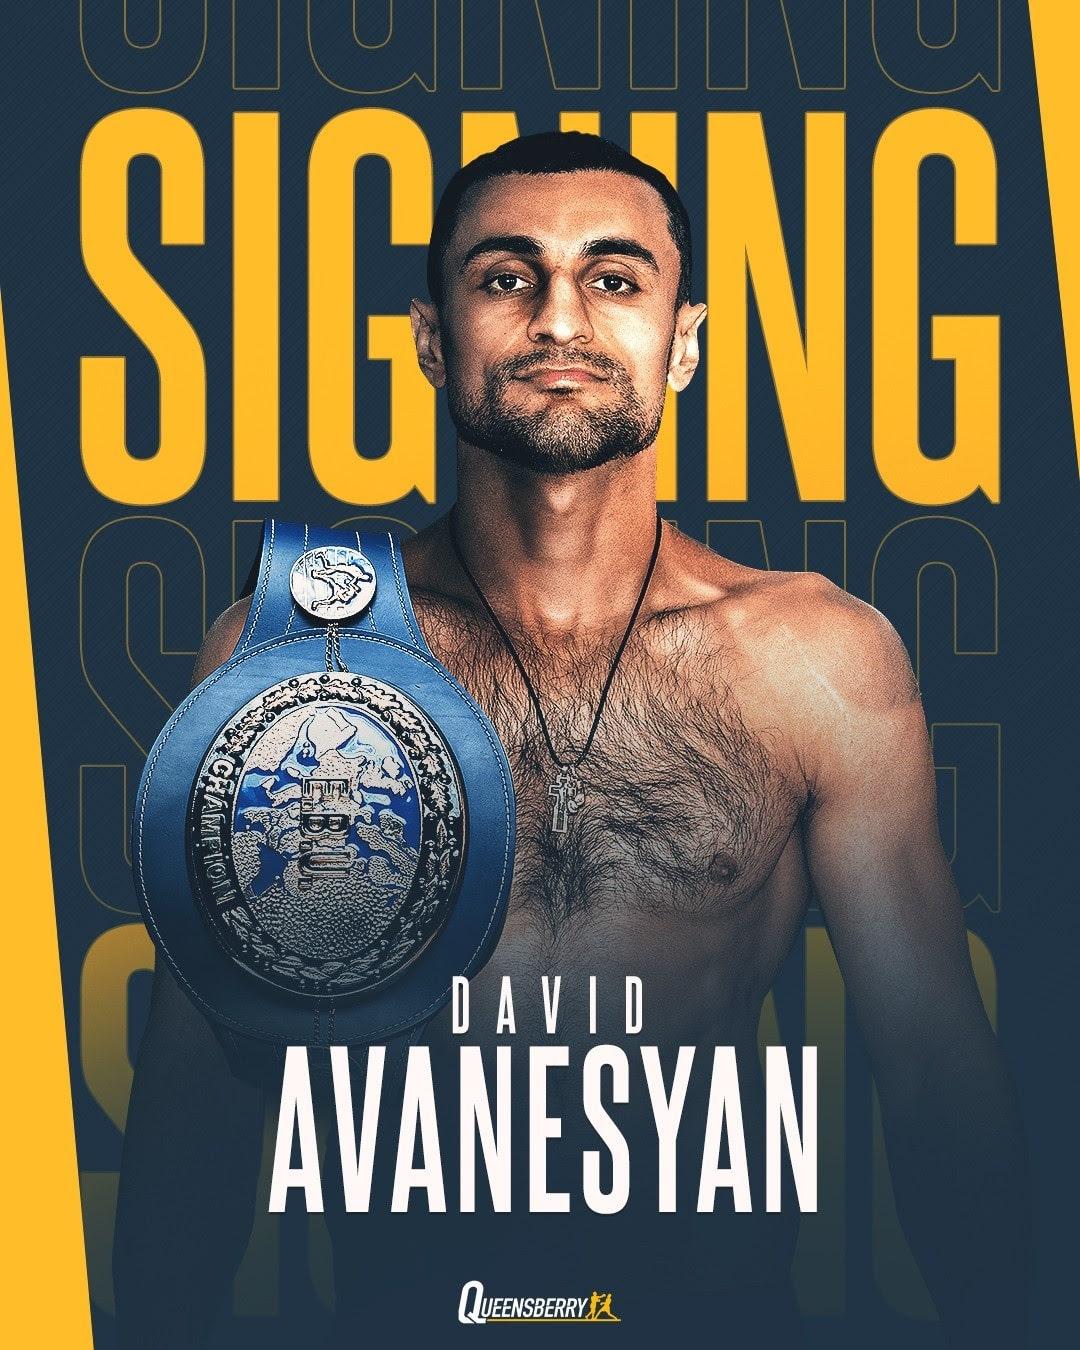 David Avanesyan - Press Room